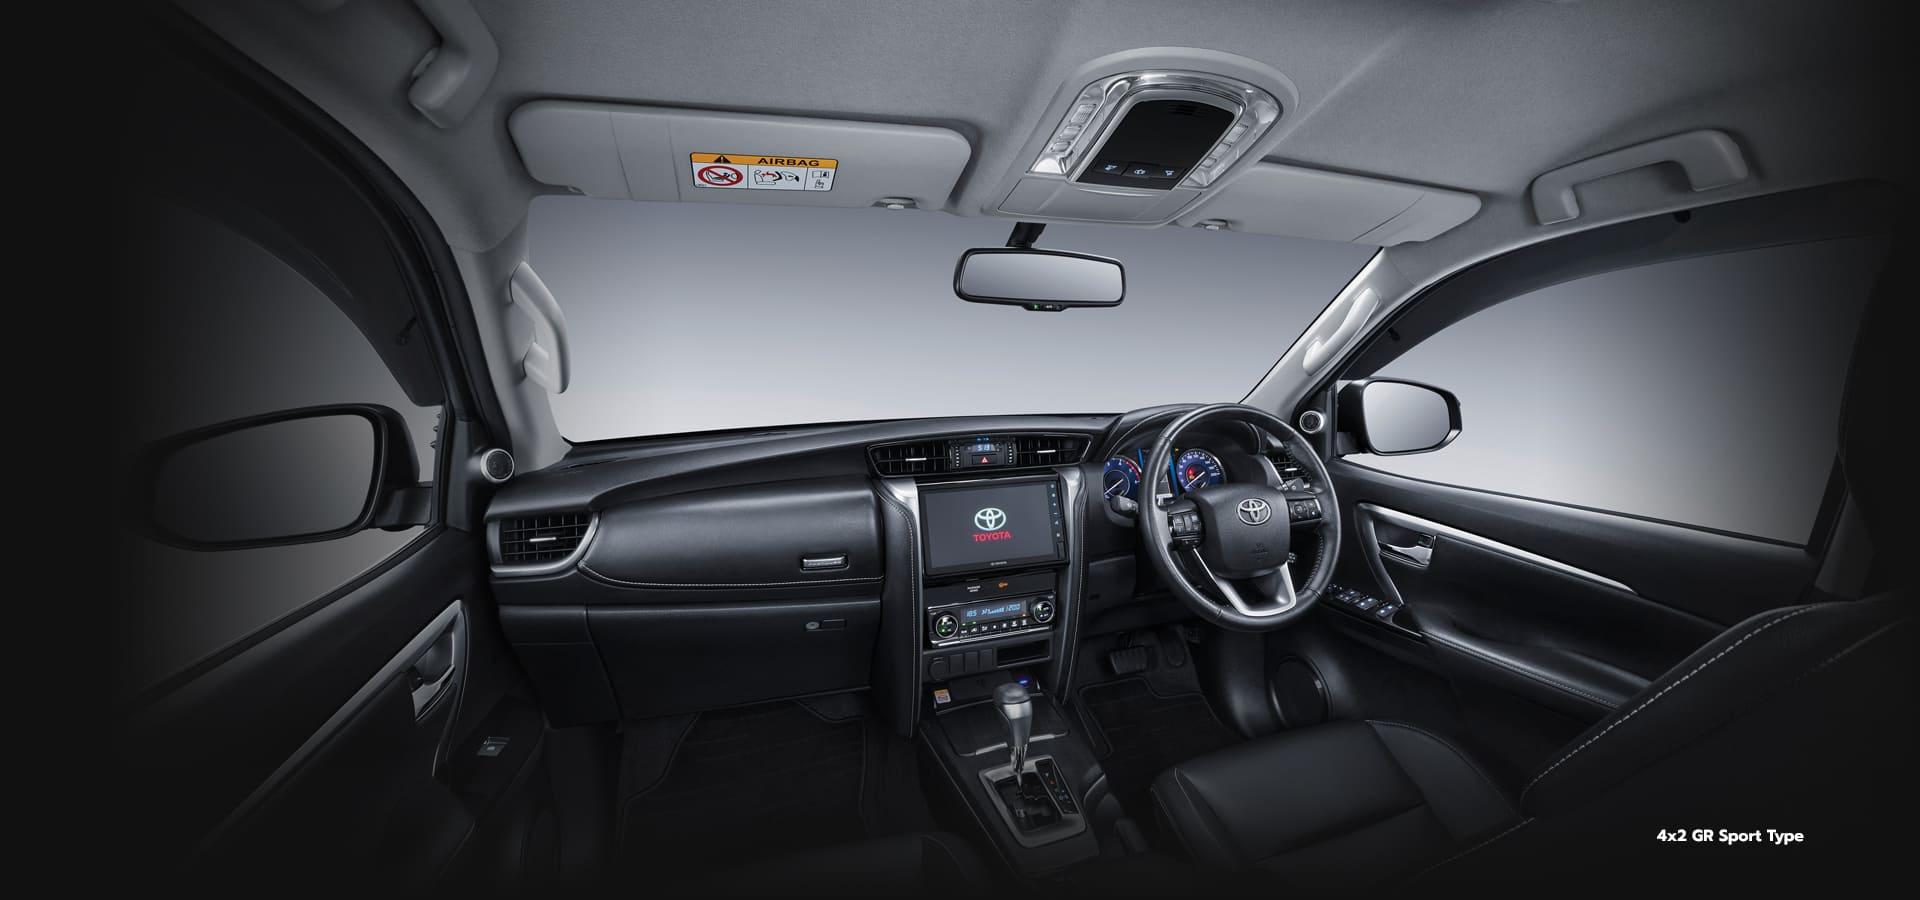 Interior SW4 GR Sport